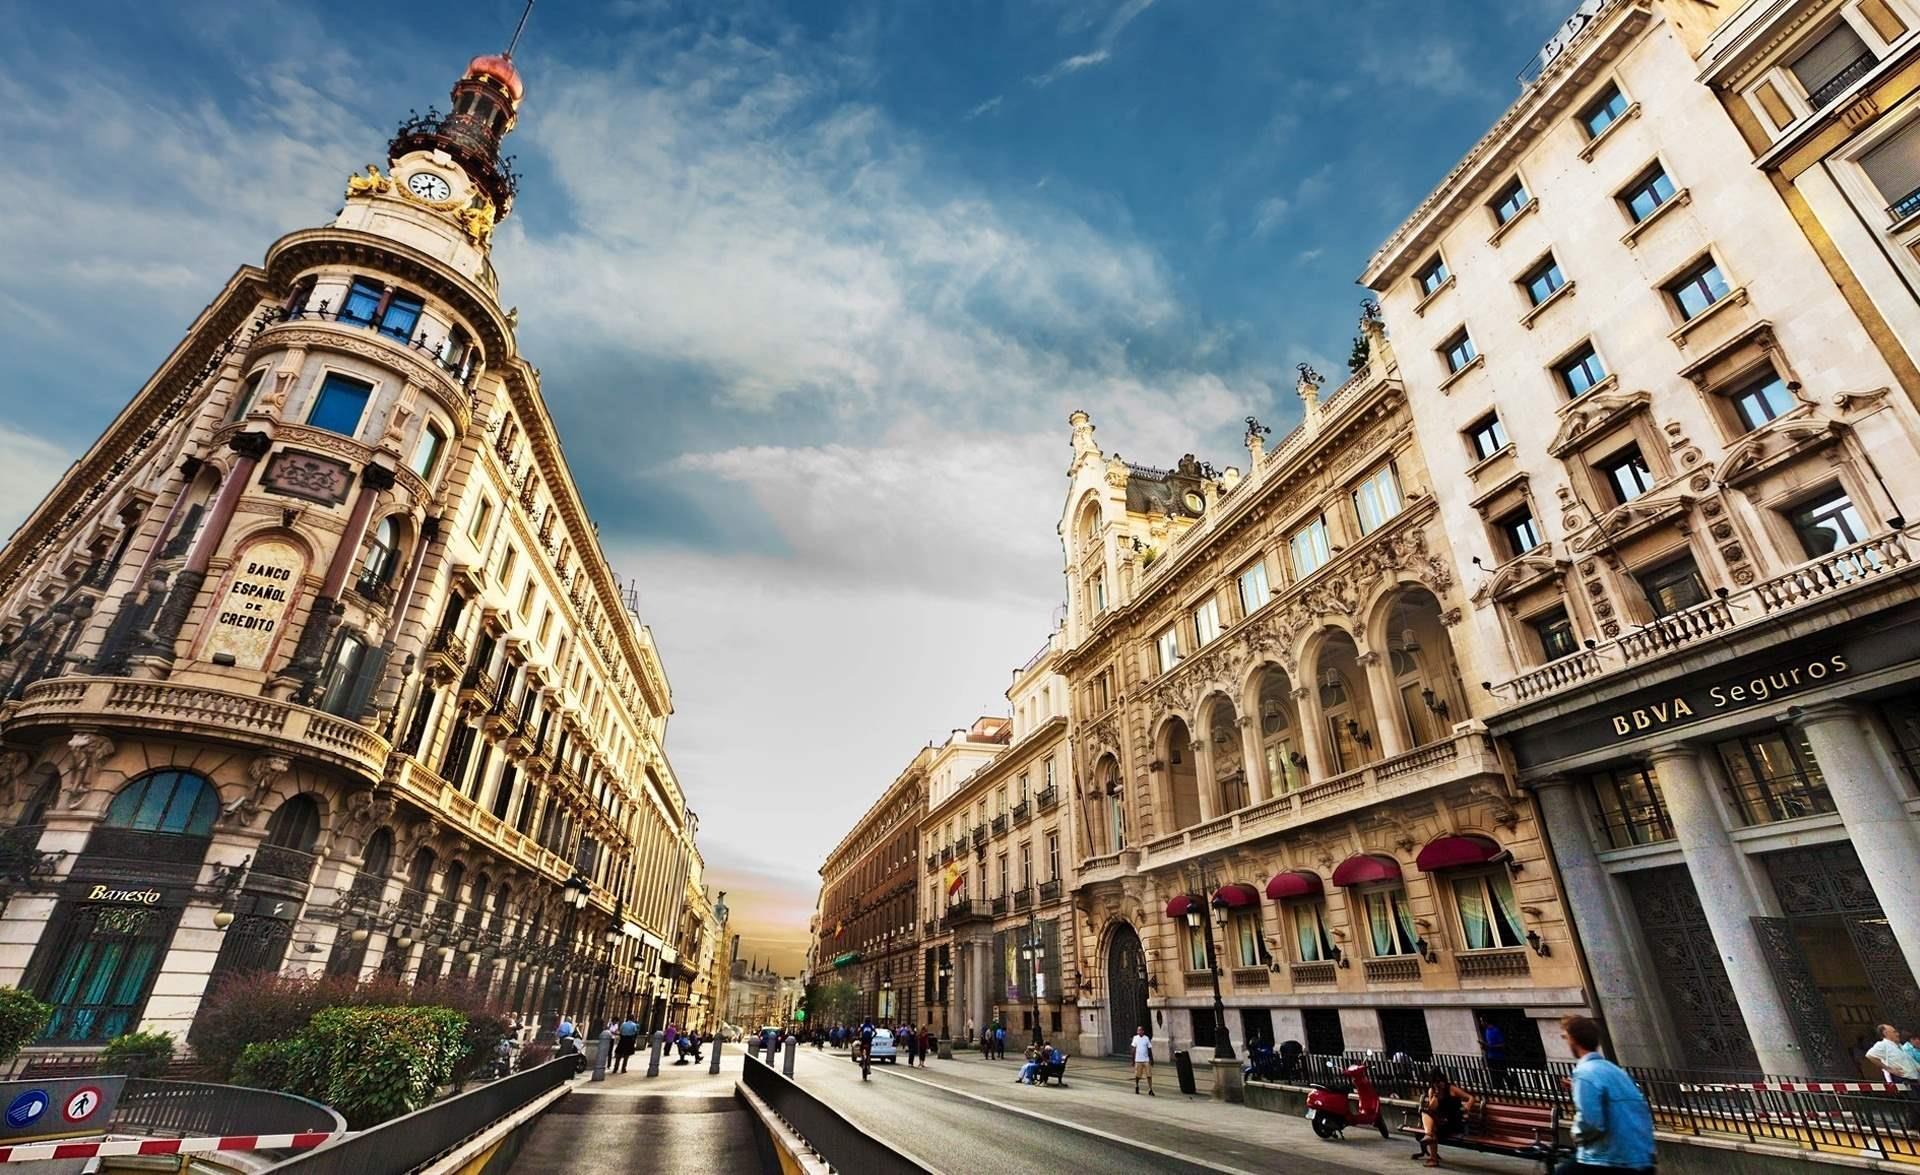 Туристам на заметку: штрафы в Испании за нарушение ПДД